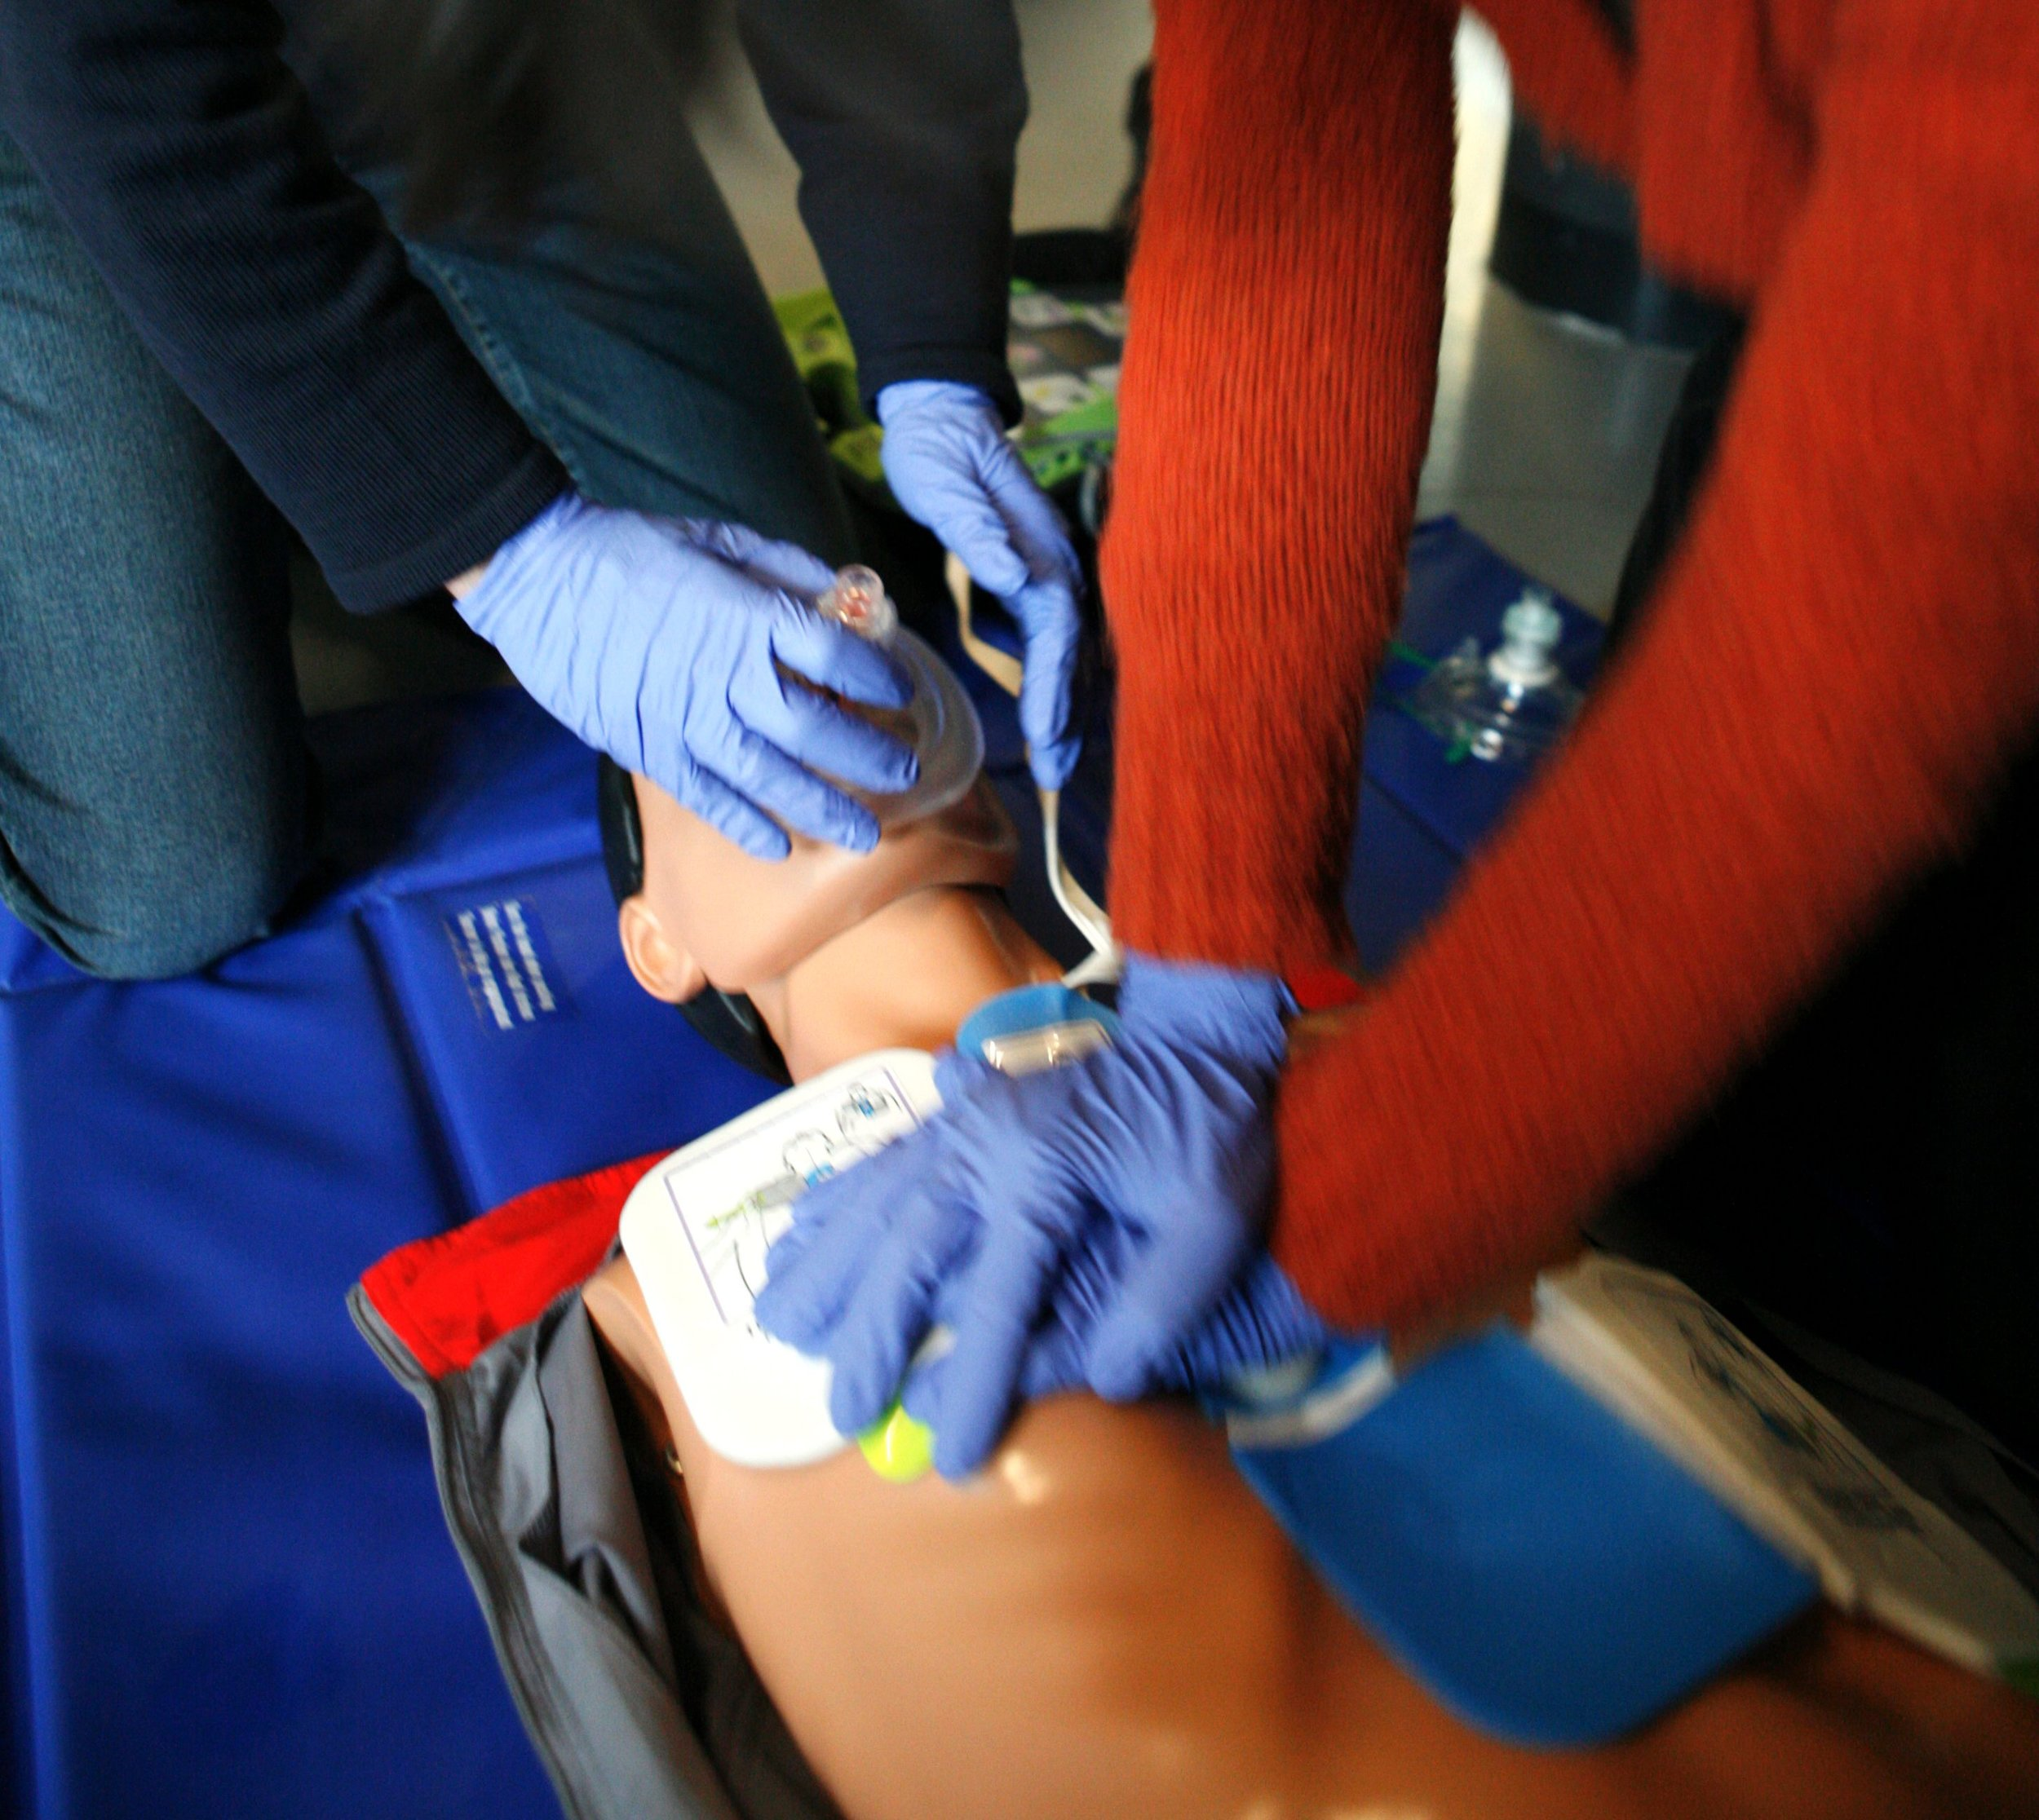 CPR_training-04.jpg